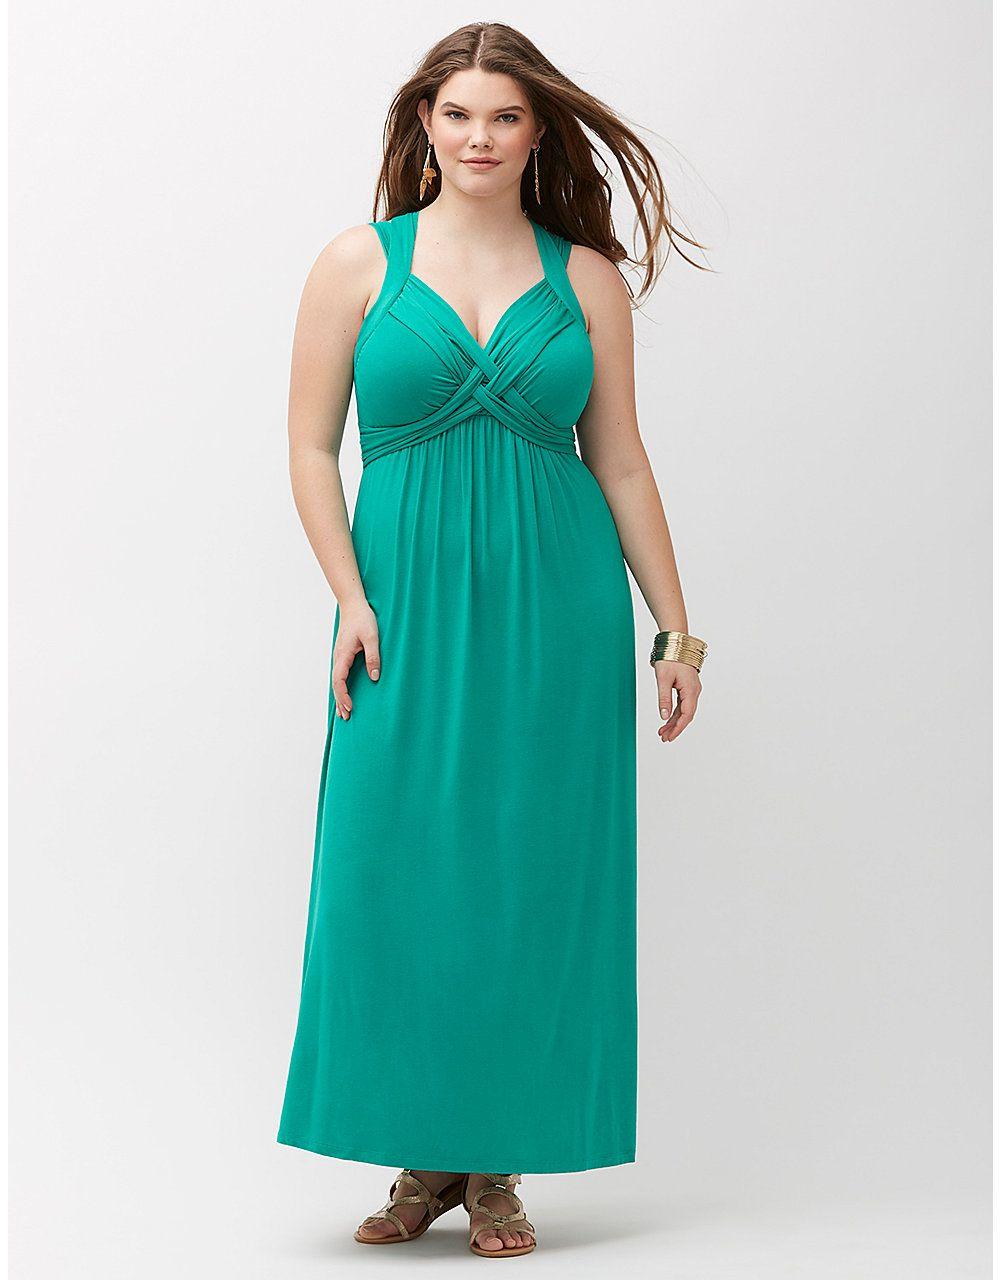 Lane Bryant Party Dresses